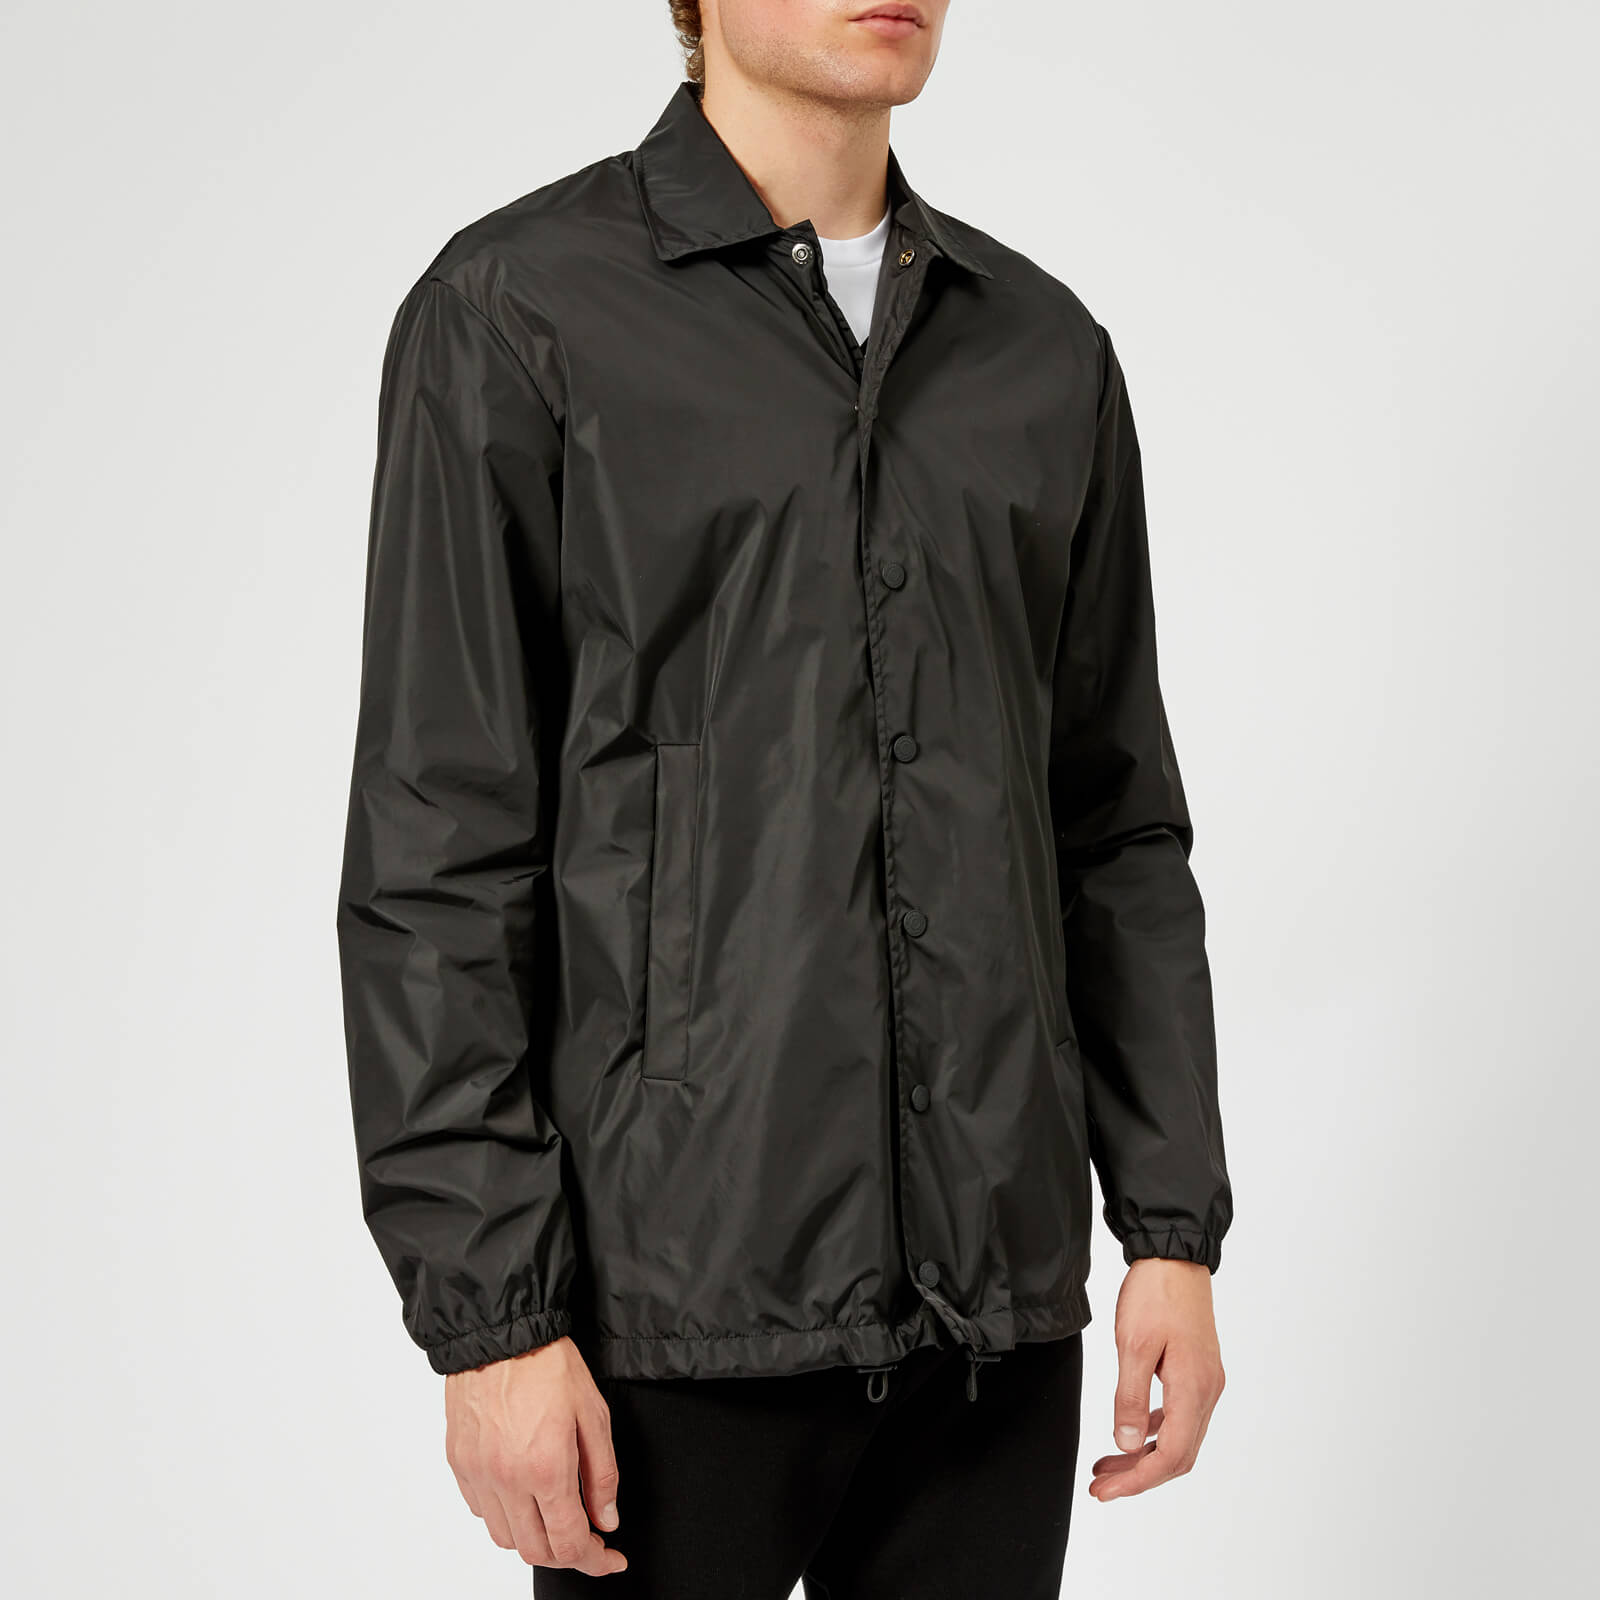 e44eb75b4 Dsquared2 Men's Nylon Coach Jacket - Black/White Print - Free UK Delivery  over £50